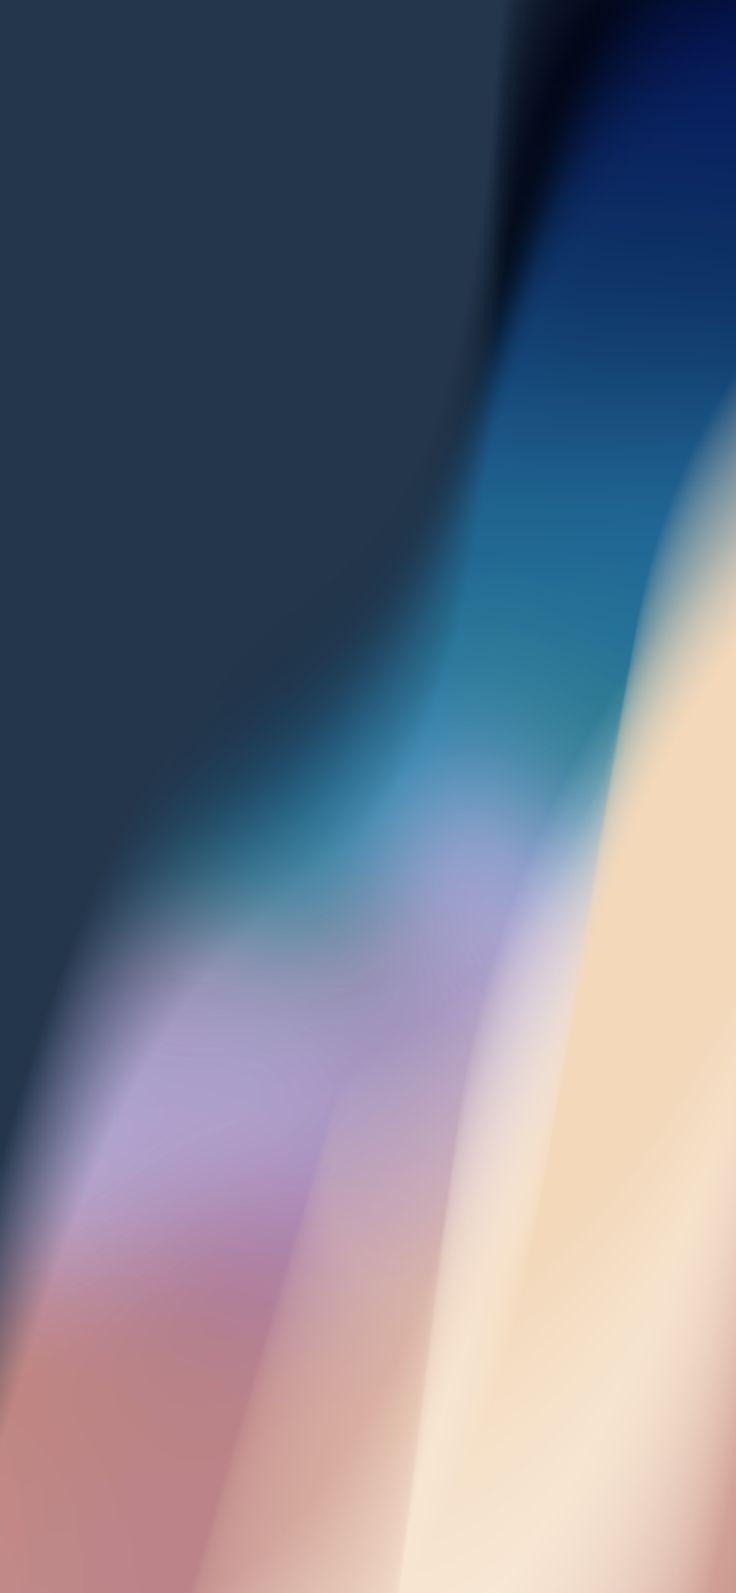 Iphonex Ios11 Ios12 Lockscreen Homescreen Hintergrund Apple Iphone Iphone In 2020 Colourful Wallpaper Iphone Samsung Wallpaper Apple Wallpaper